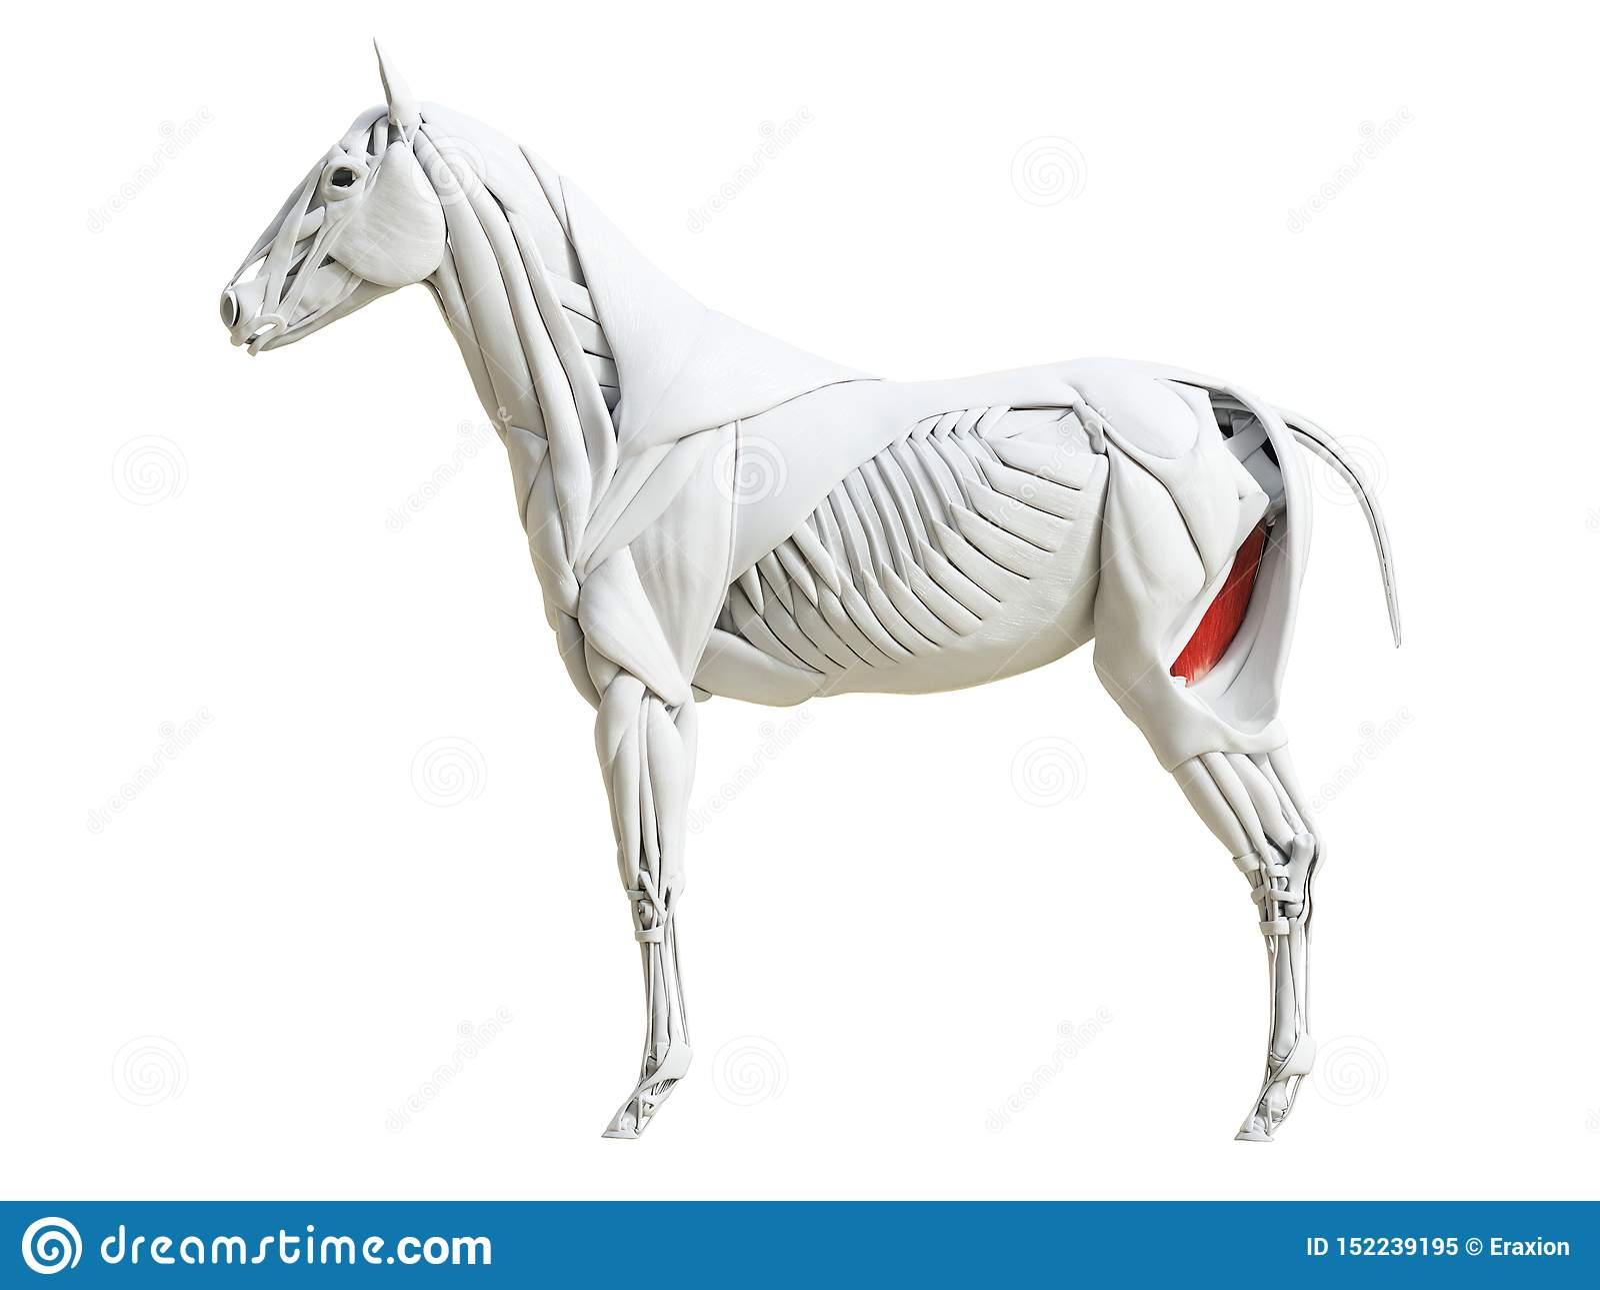 Equine анатомия мышцы - gracilis